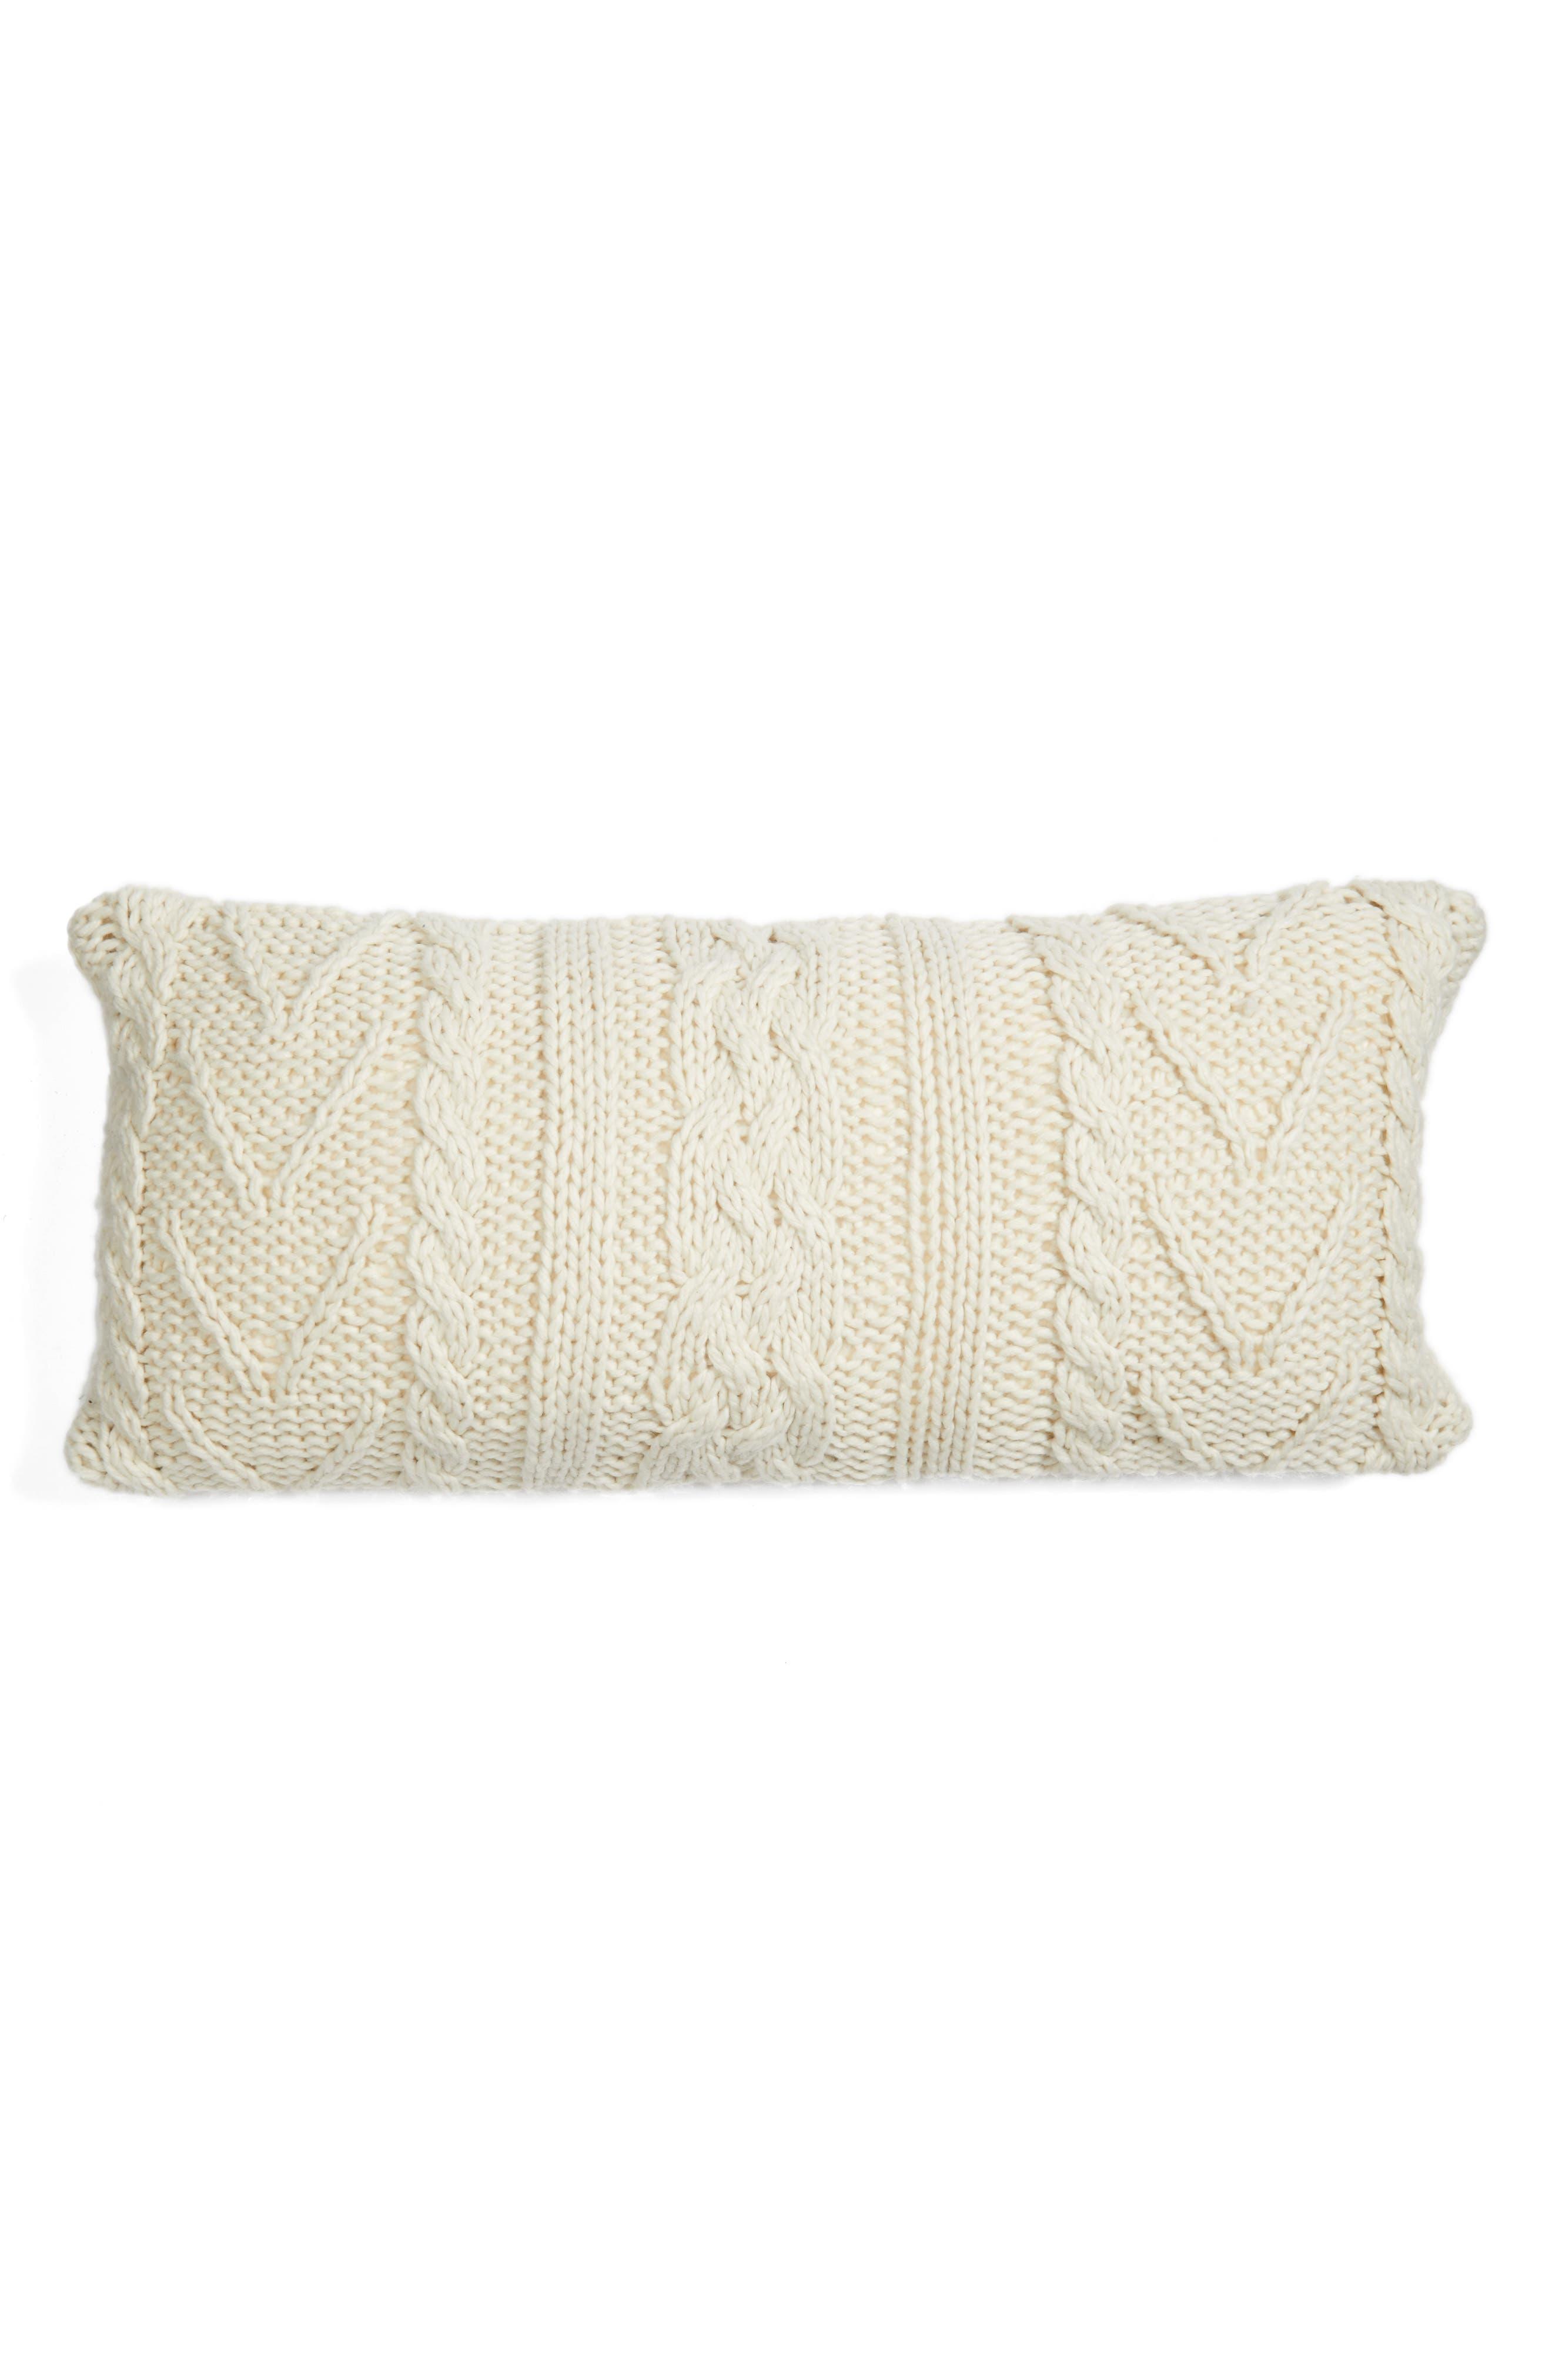 Cable Knit Accent Pillow,                             Main thumbnail 2, color,